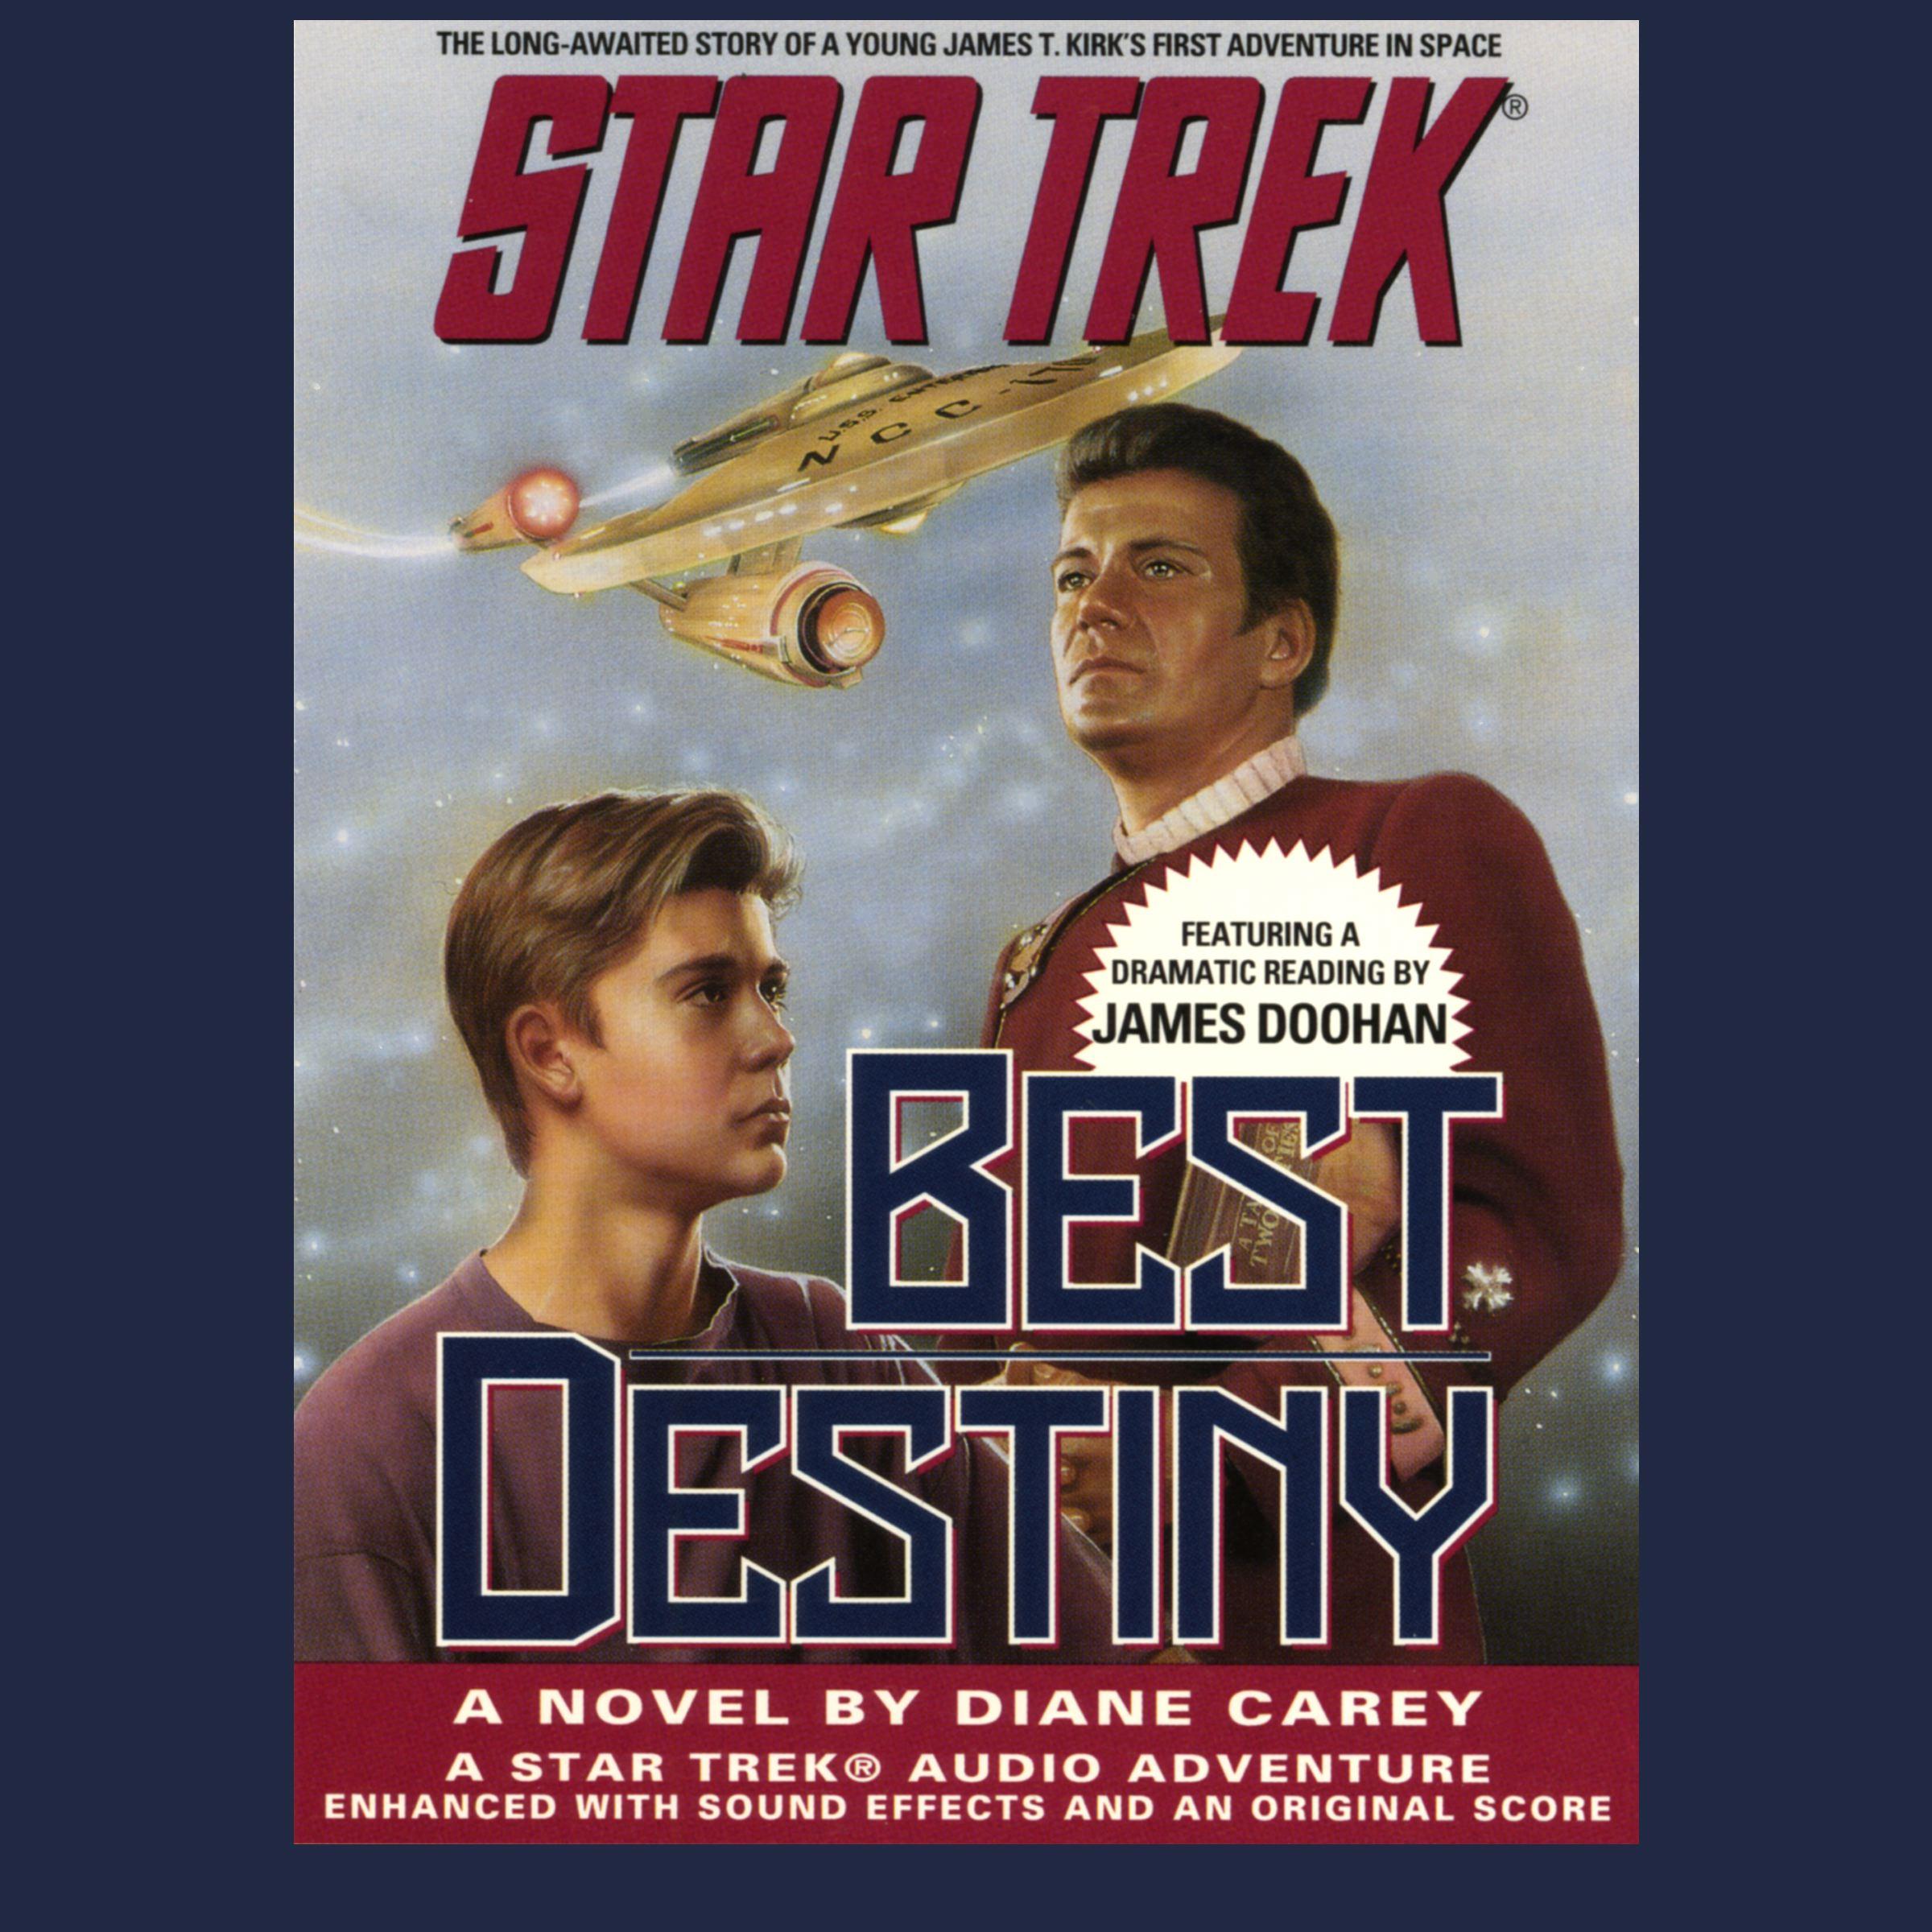 Star trek best destiny 9781442368330 hr